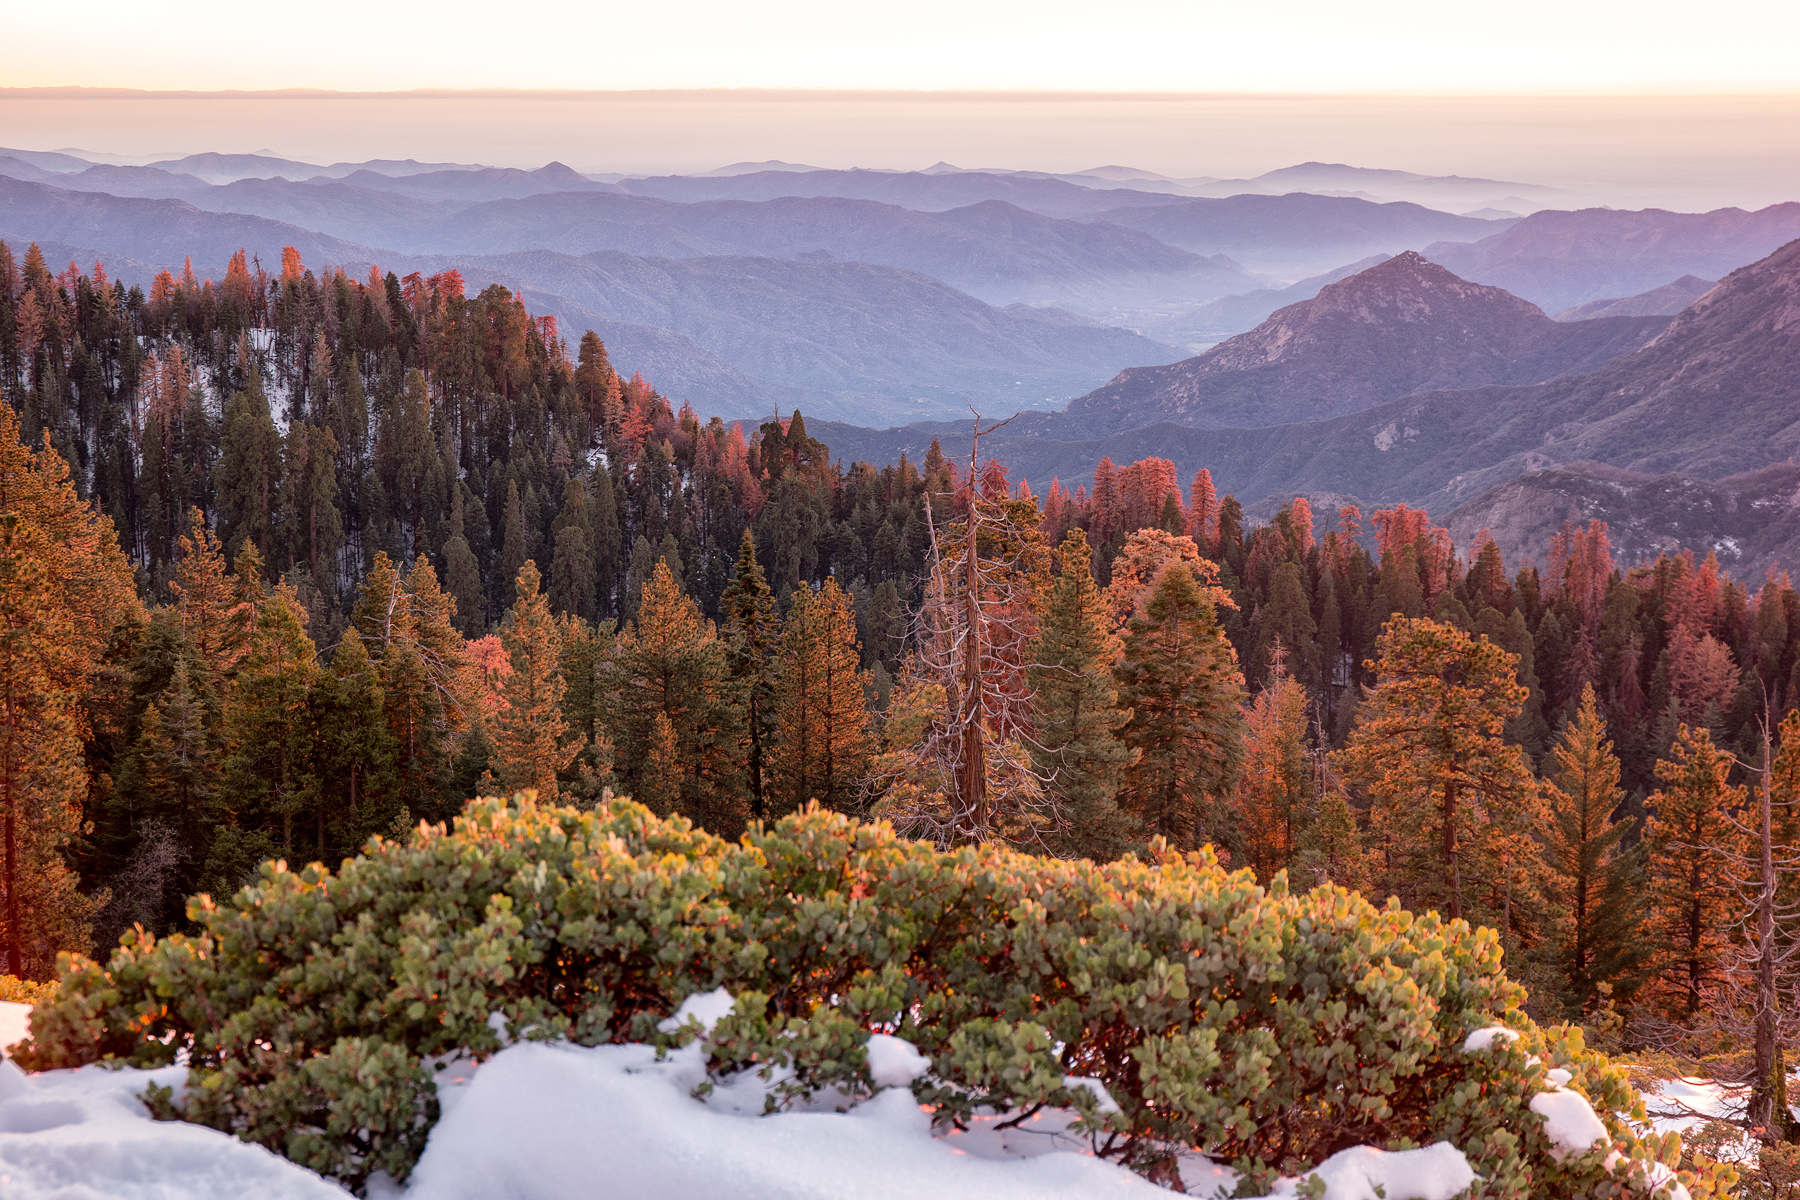 Wasim Muklashy Photography_Sequoia National Park_California_December 2015_-SAM_4189-Edit.jpg